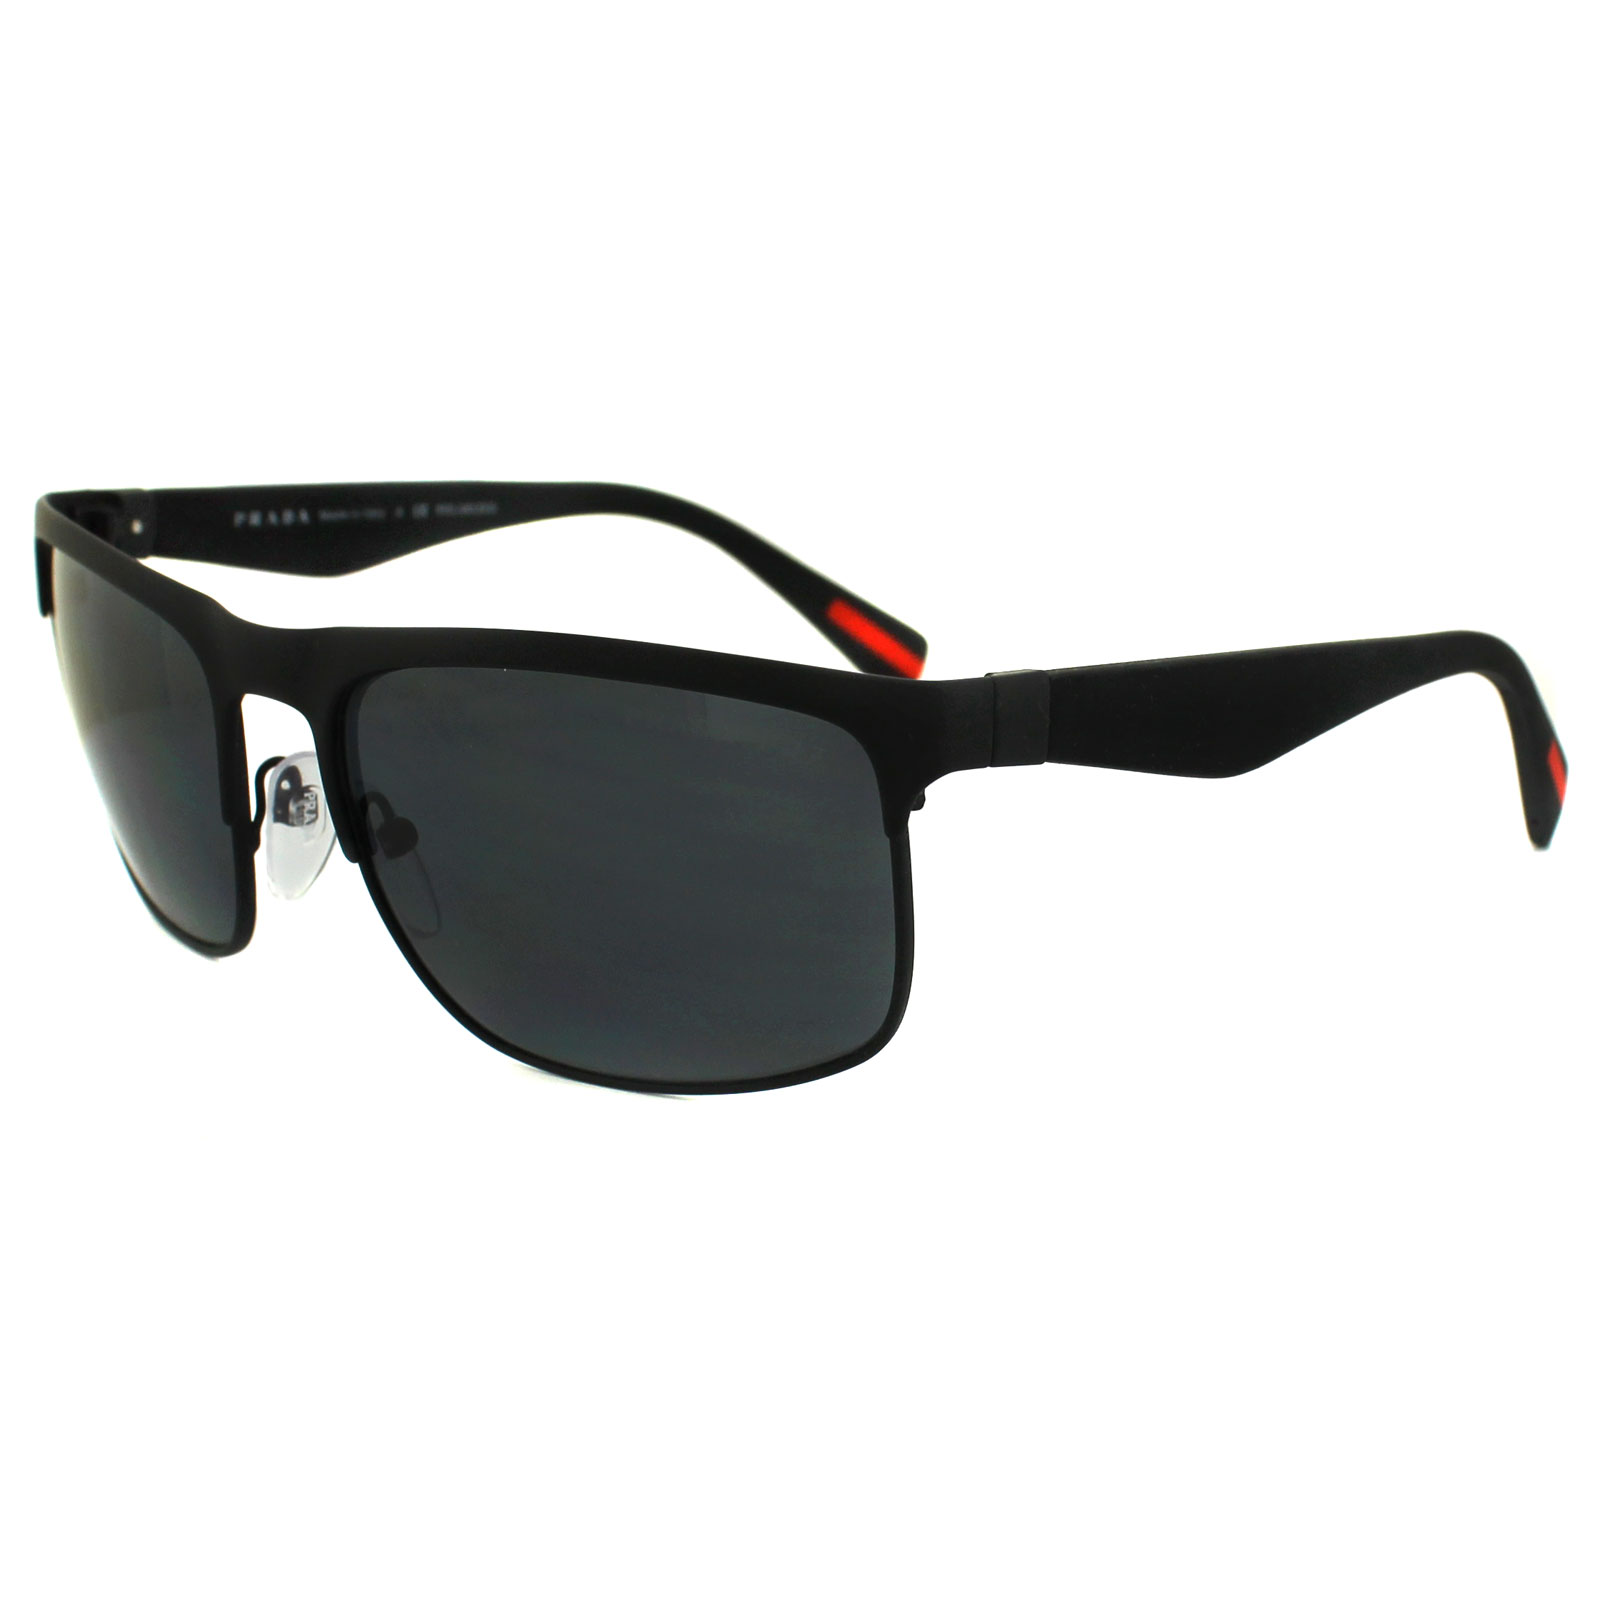 69334613fdf75 Cheap Prada Sport 56PS Sunglasses - Discounted Sunglasses